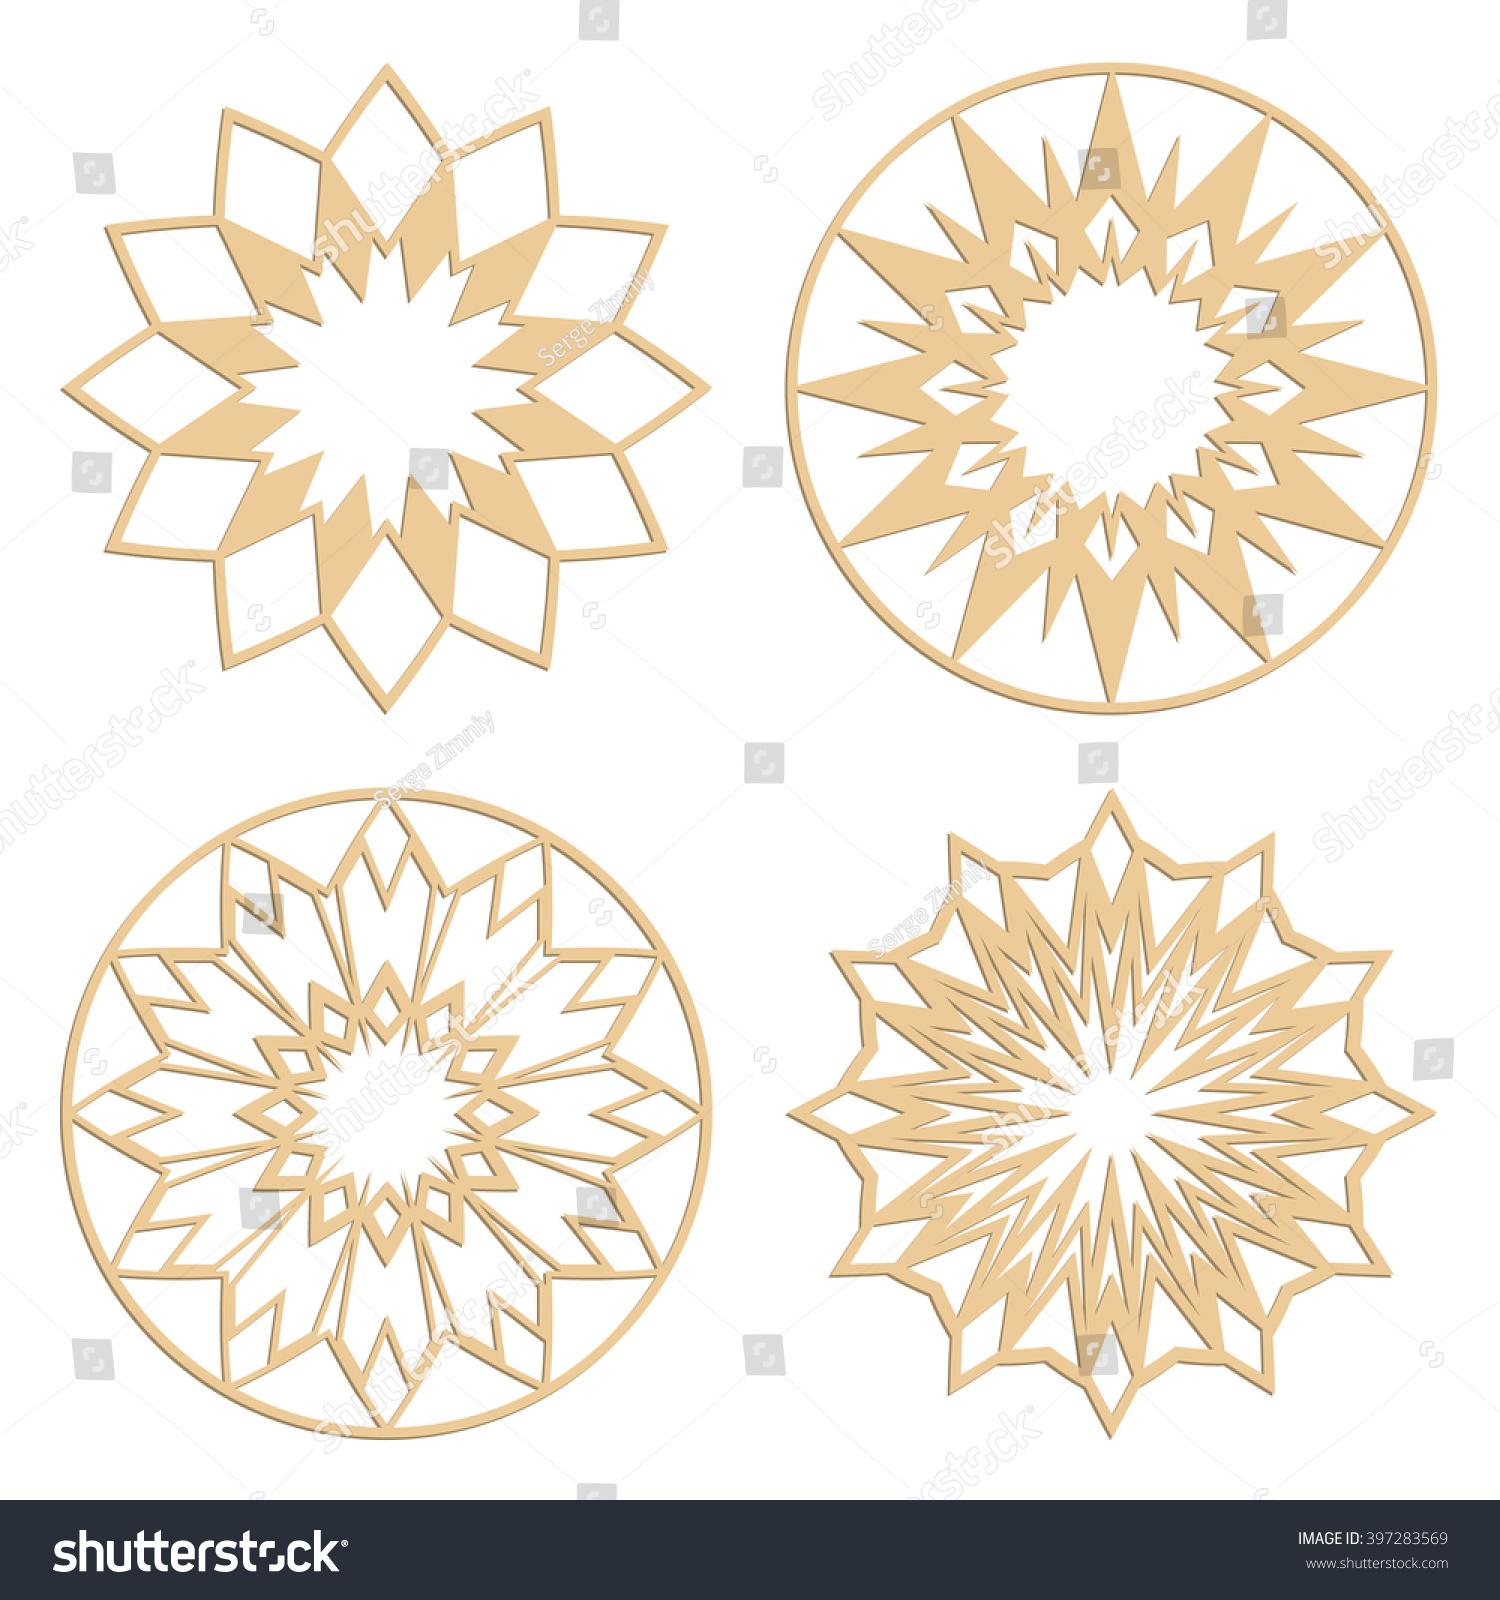 diy laser cutting patterns islamic die stock vector 397283569